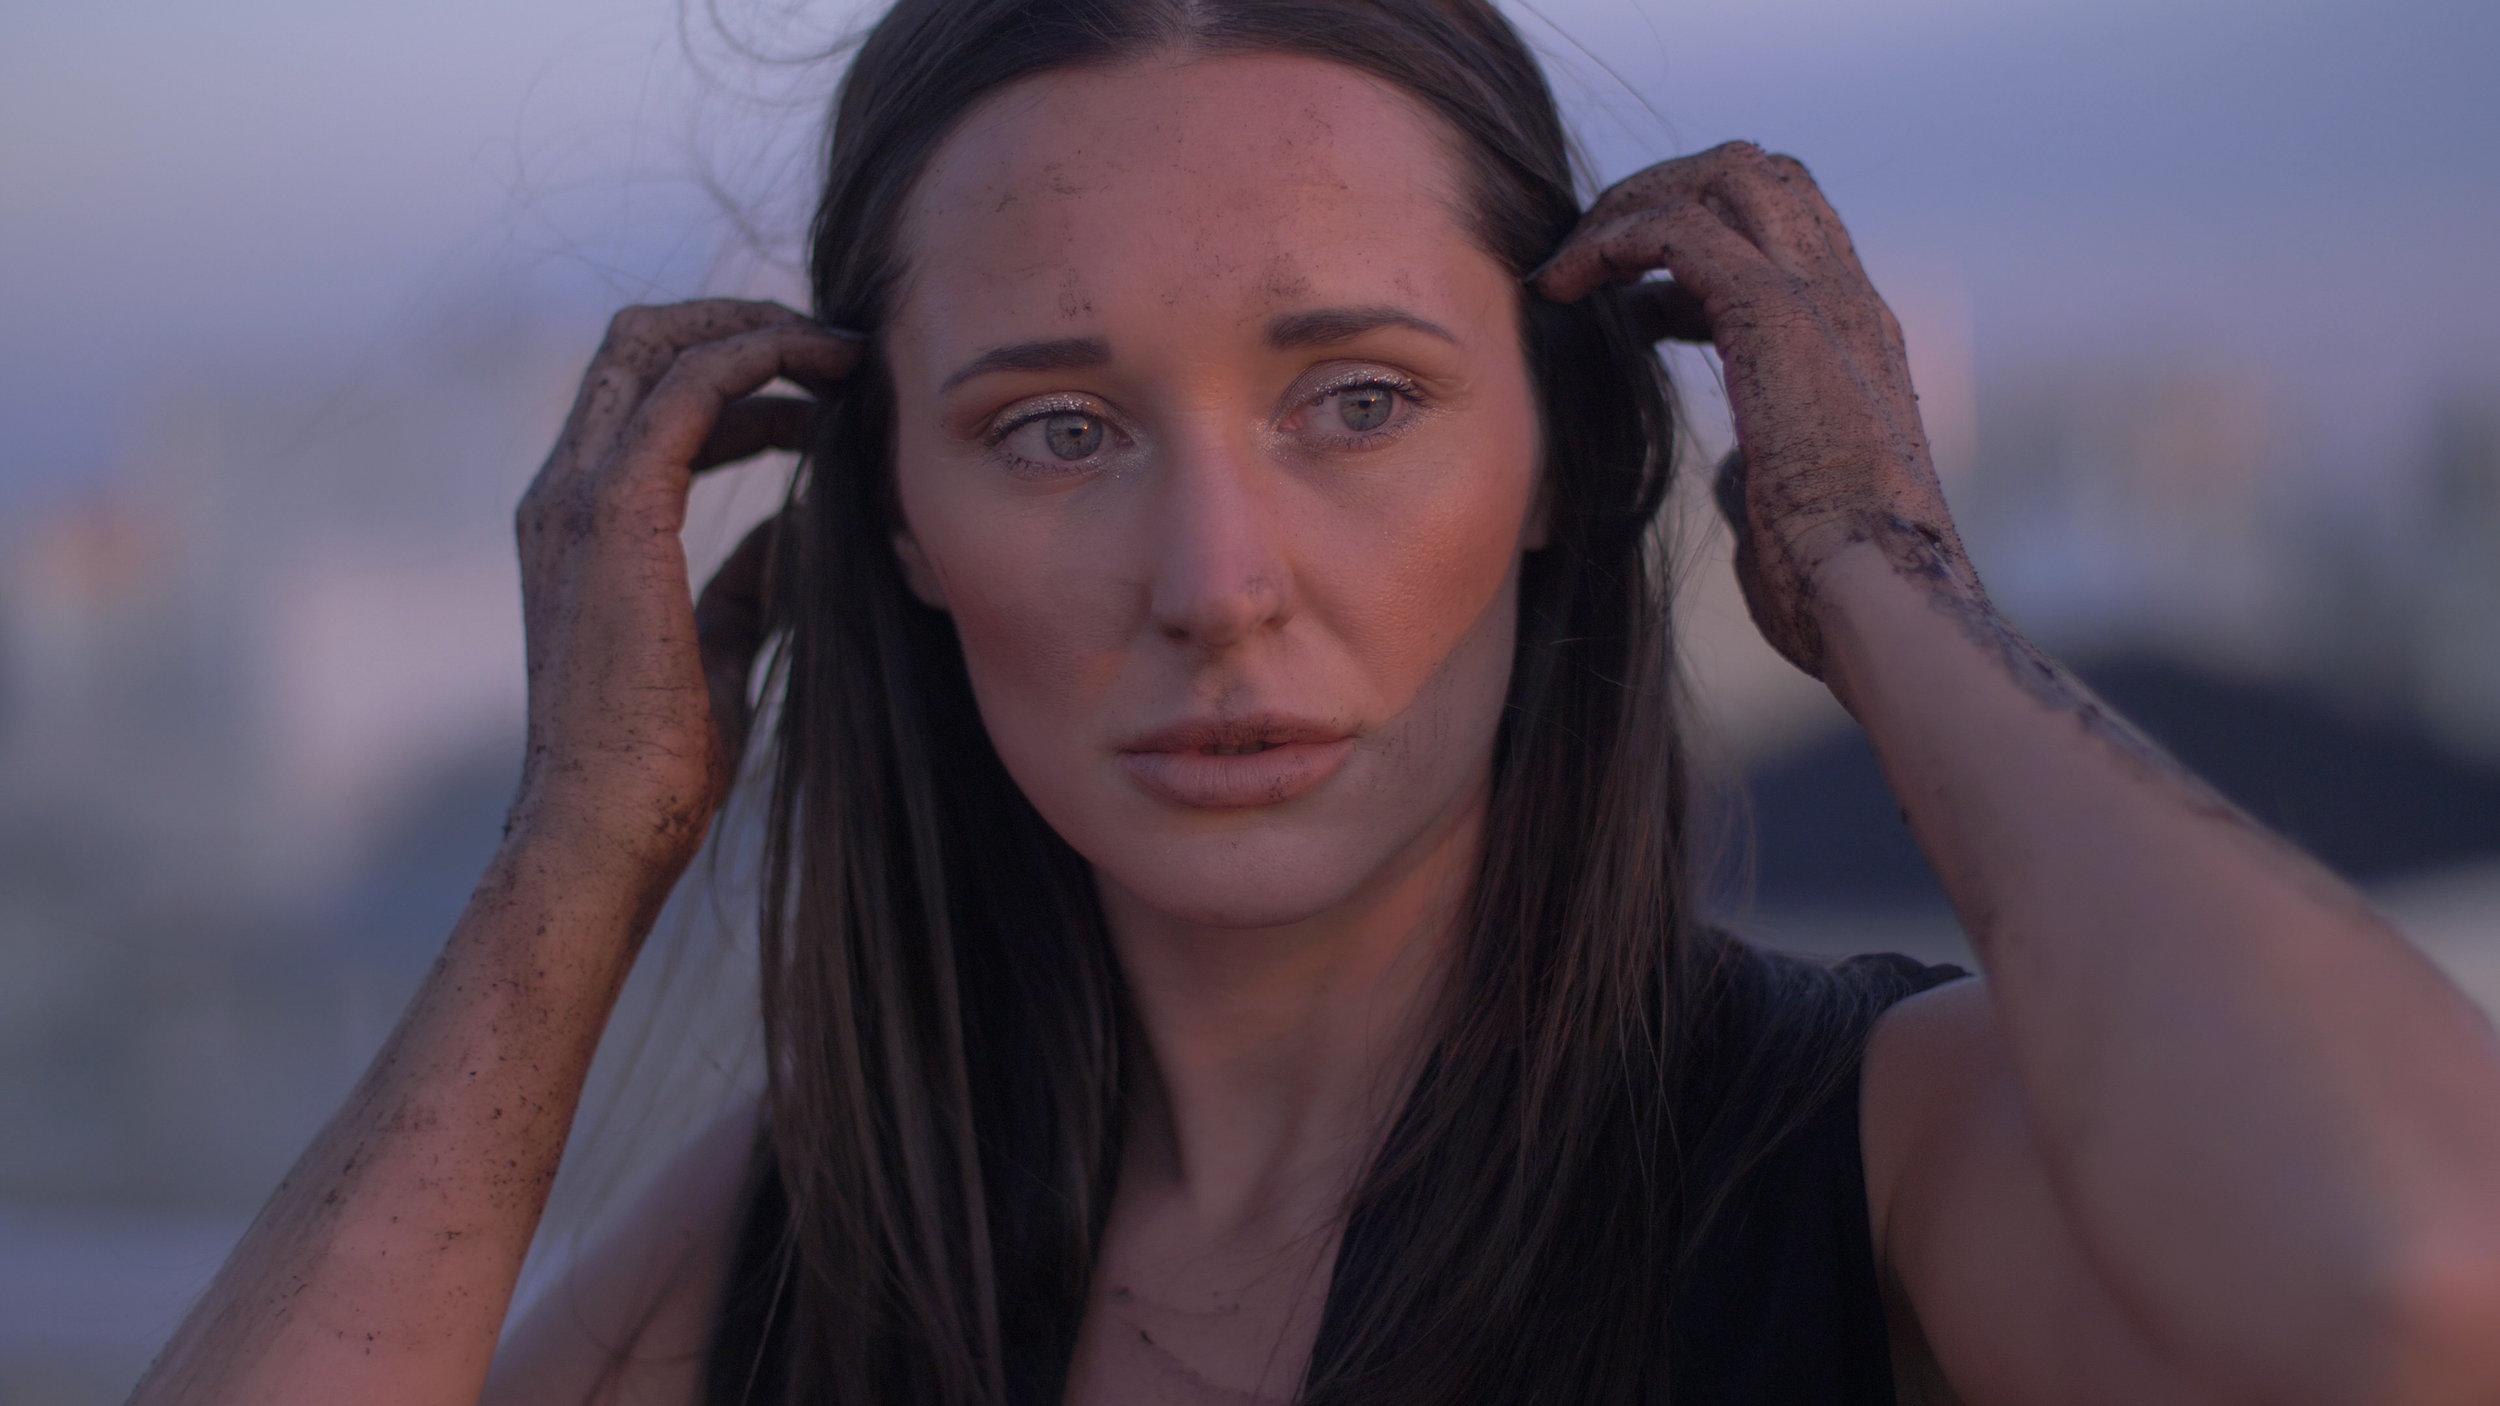 Carolina Haldemann, Egresada 2013, Actríz, Notera, Cronista